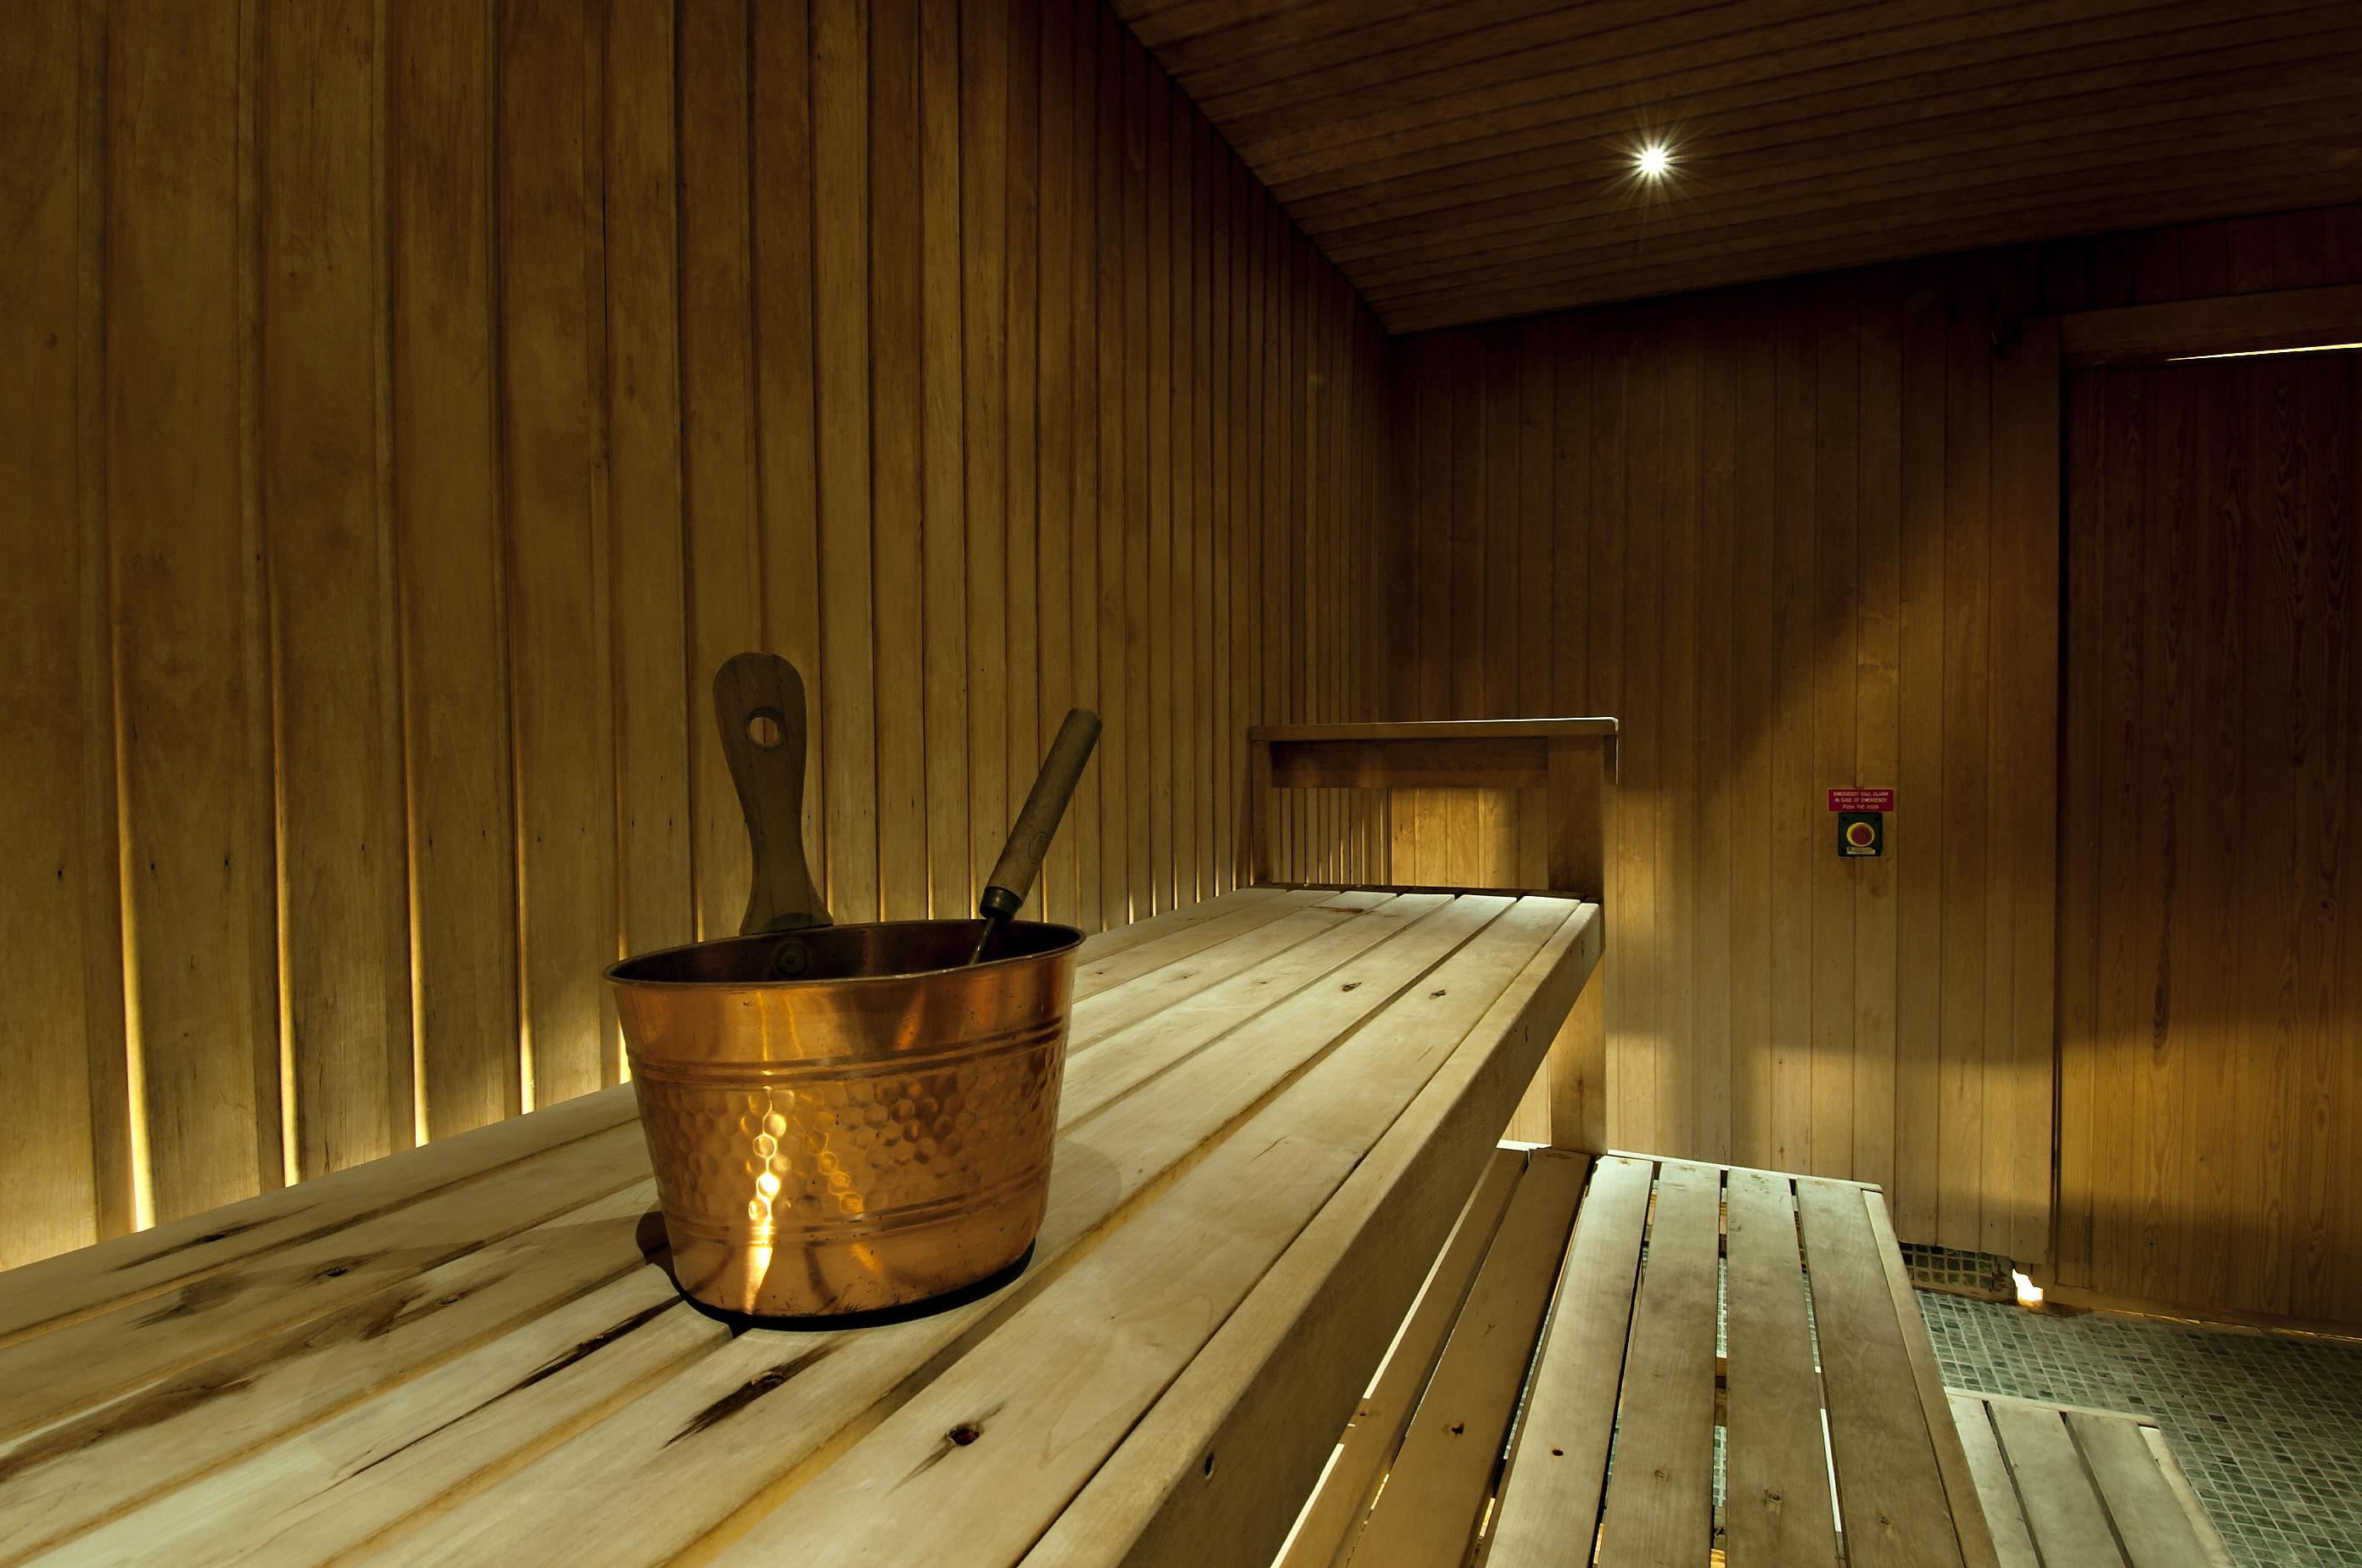 Carnival Sensation Spa Sauna 1.jpg